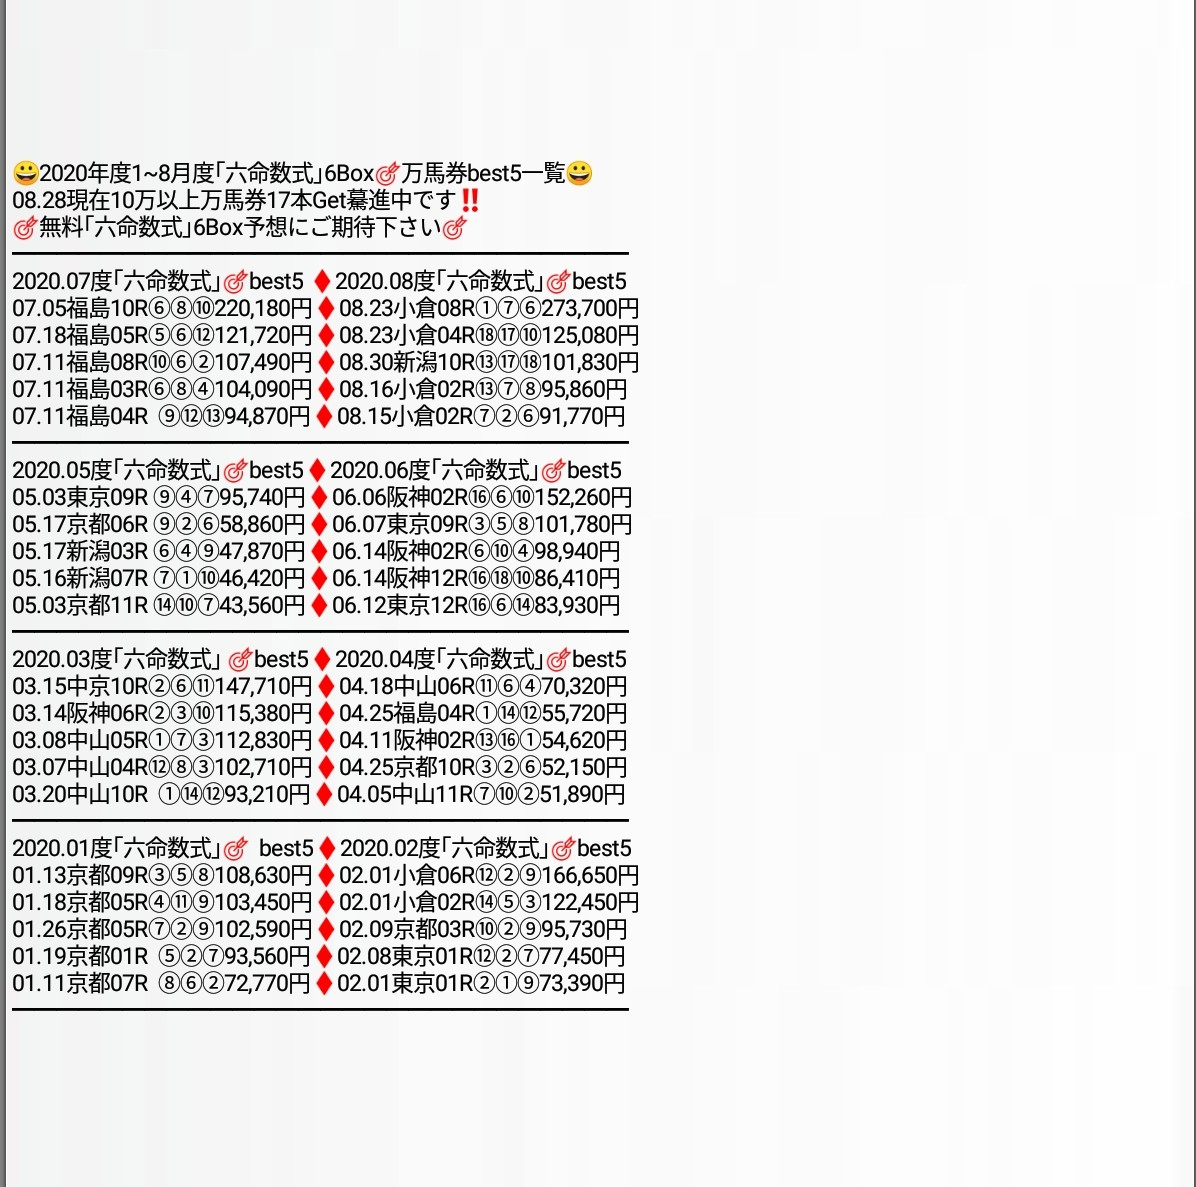 09.26中京05R馬単、三連単6頭Box .F予想公開09.26中京05R❶❷❸❹❺❻六命数.6馬番  ②④⑥⑧⑨⑩各軸馬単3点、三連単F12点⑧⇒④⑥⑨⇒②④⑥⑧⑨⑩④⇒②⑥⑧⇒②④⑥⑧⑨⑩⑩⇒⑥⑧⑨⇒②④⑥⑧⑨⑩②⇒⑥⑧⑩⇒②④⑥⑧⑨⑩他のレースはで販売中‼️